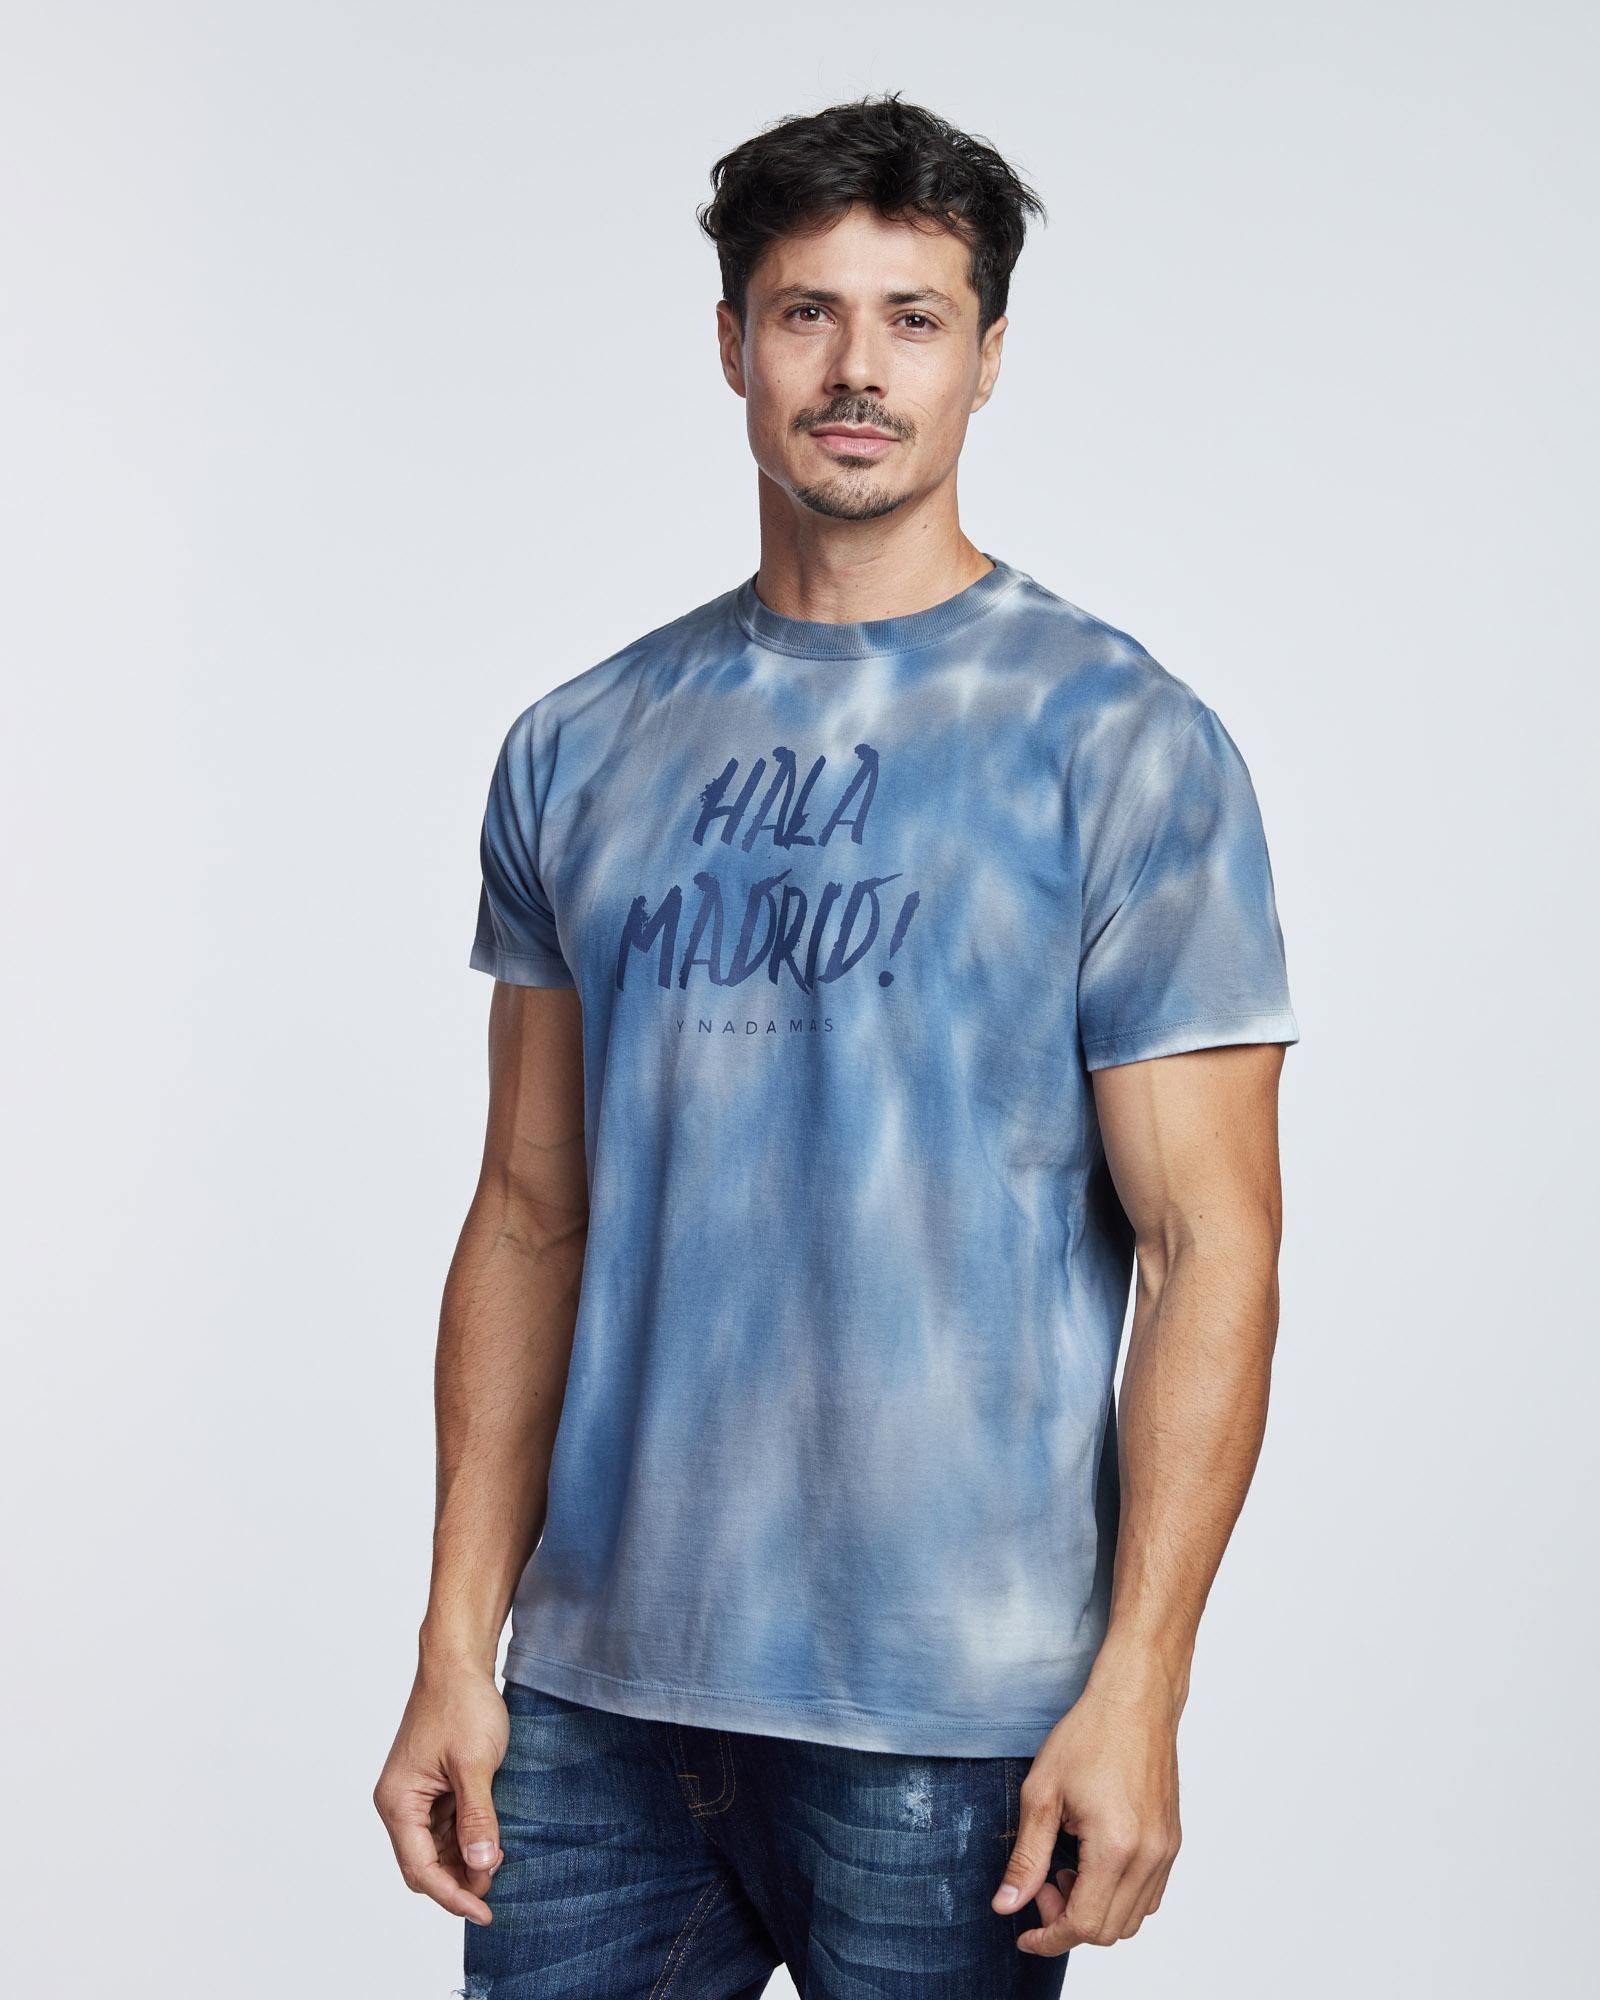 Camiseta Tyedye Hala Madrid Masculina Evolvee